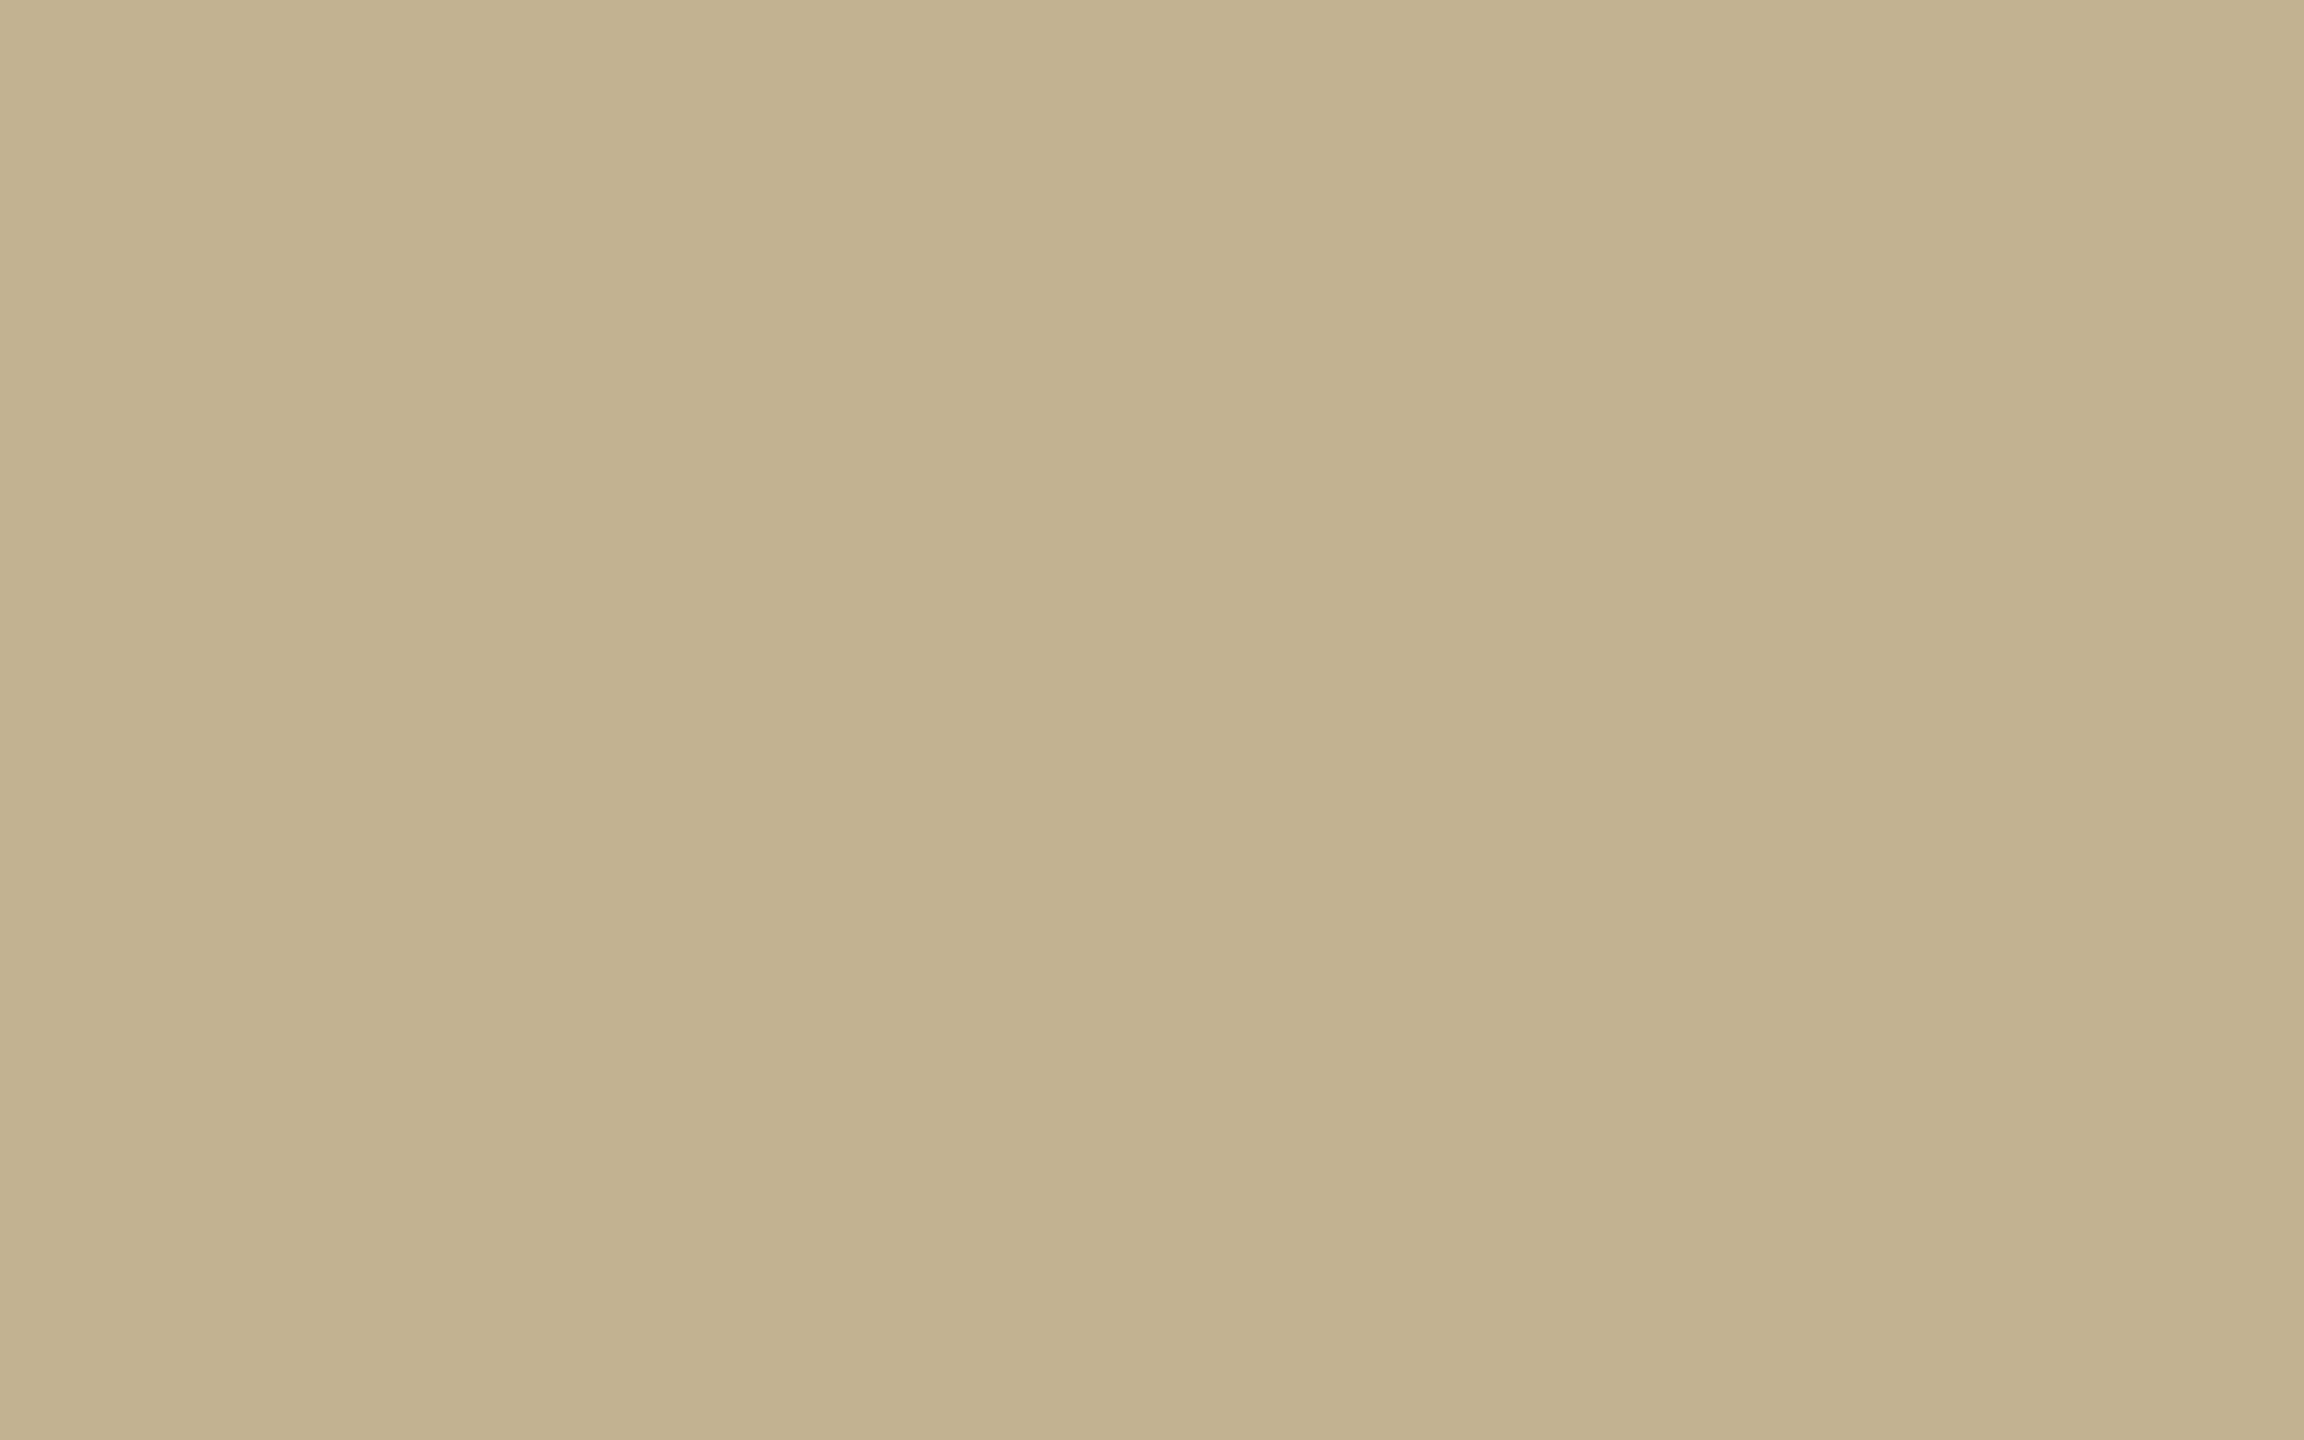 2304x1440 Khaki Web Solid Color Background